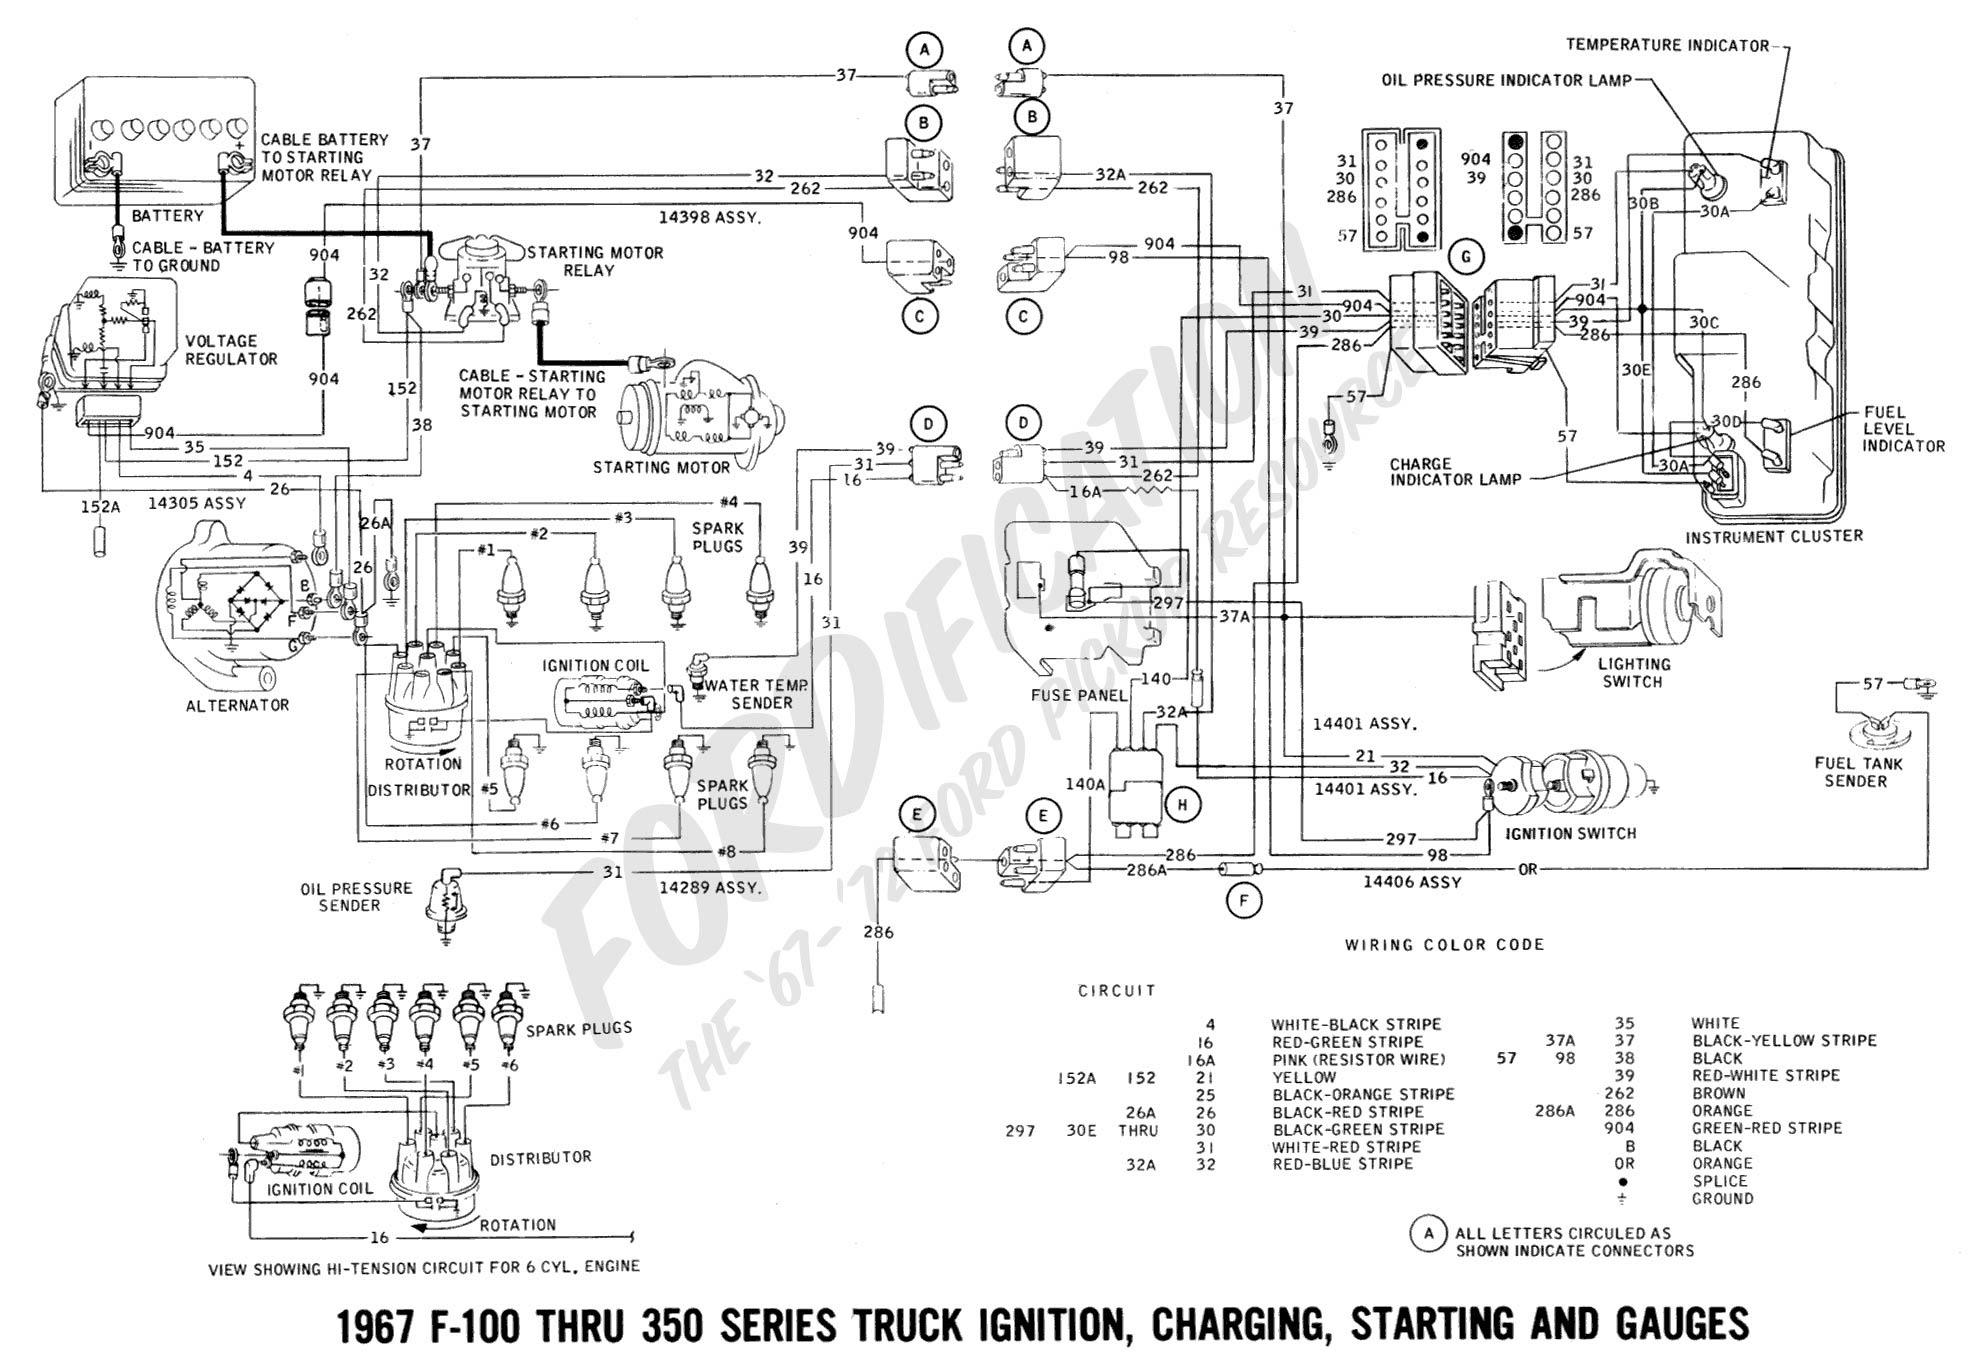 Diagram 1971 F100 Charging System Wiring Diagram Full Version Hd Quality Wiring Diagram Luroelectrical Aduis Bricolage Fr